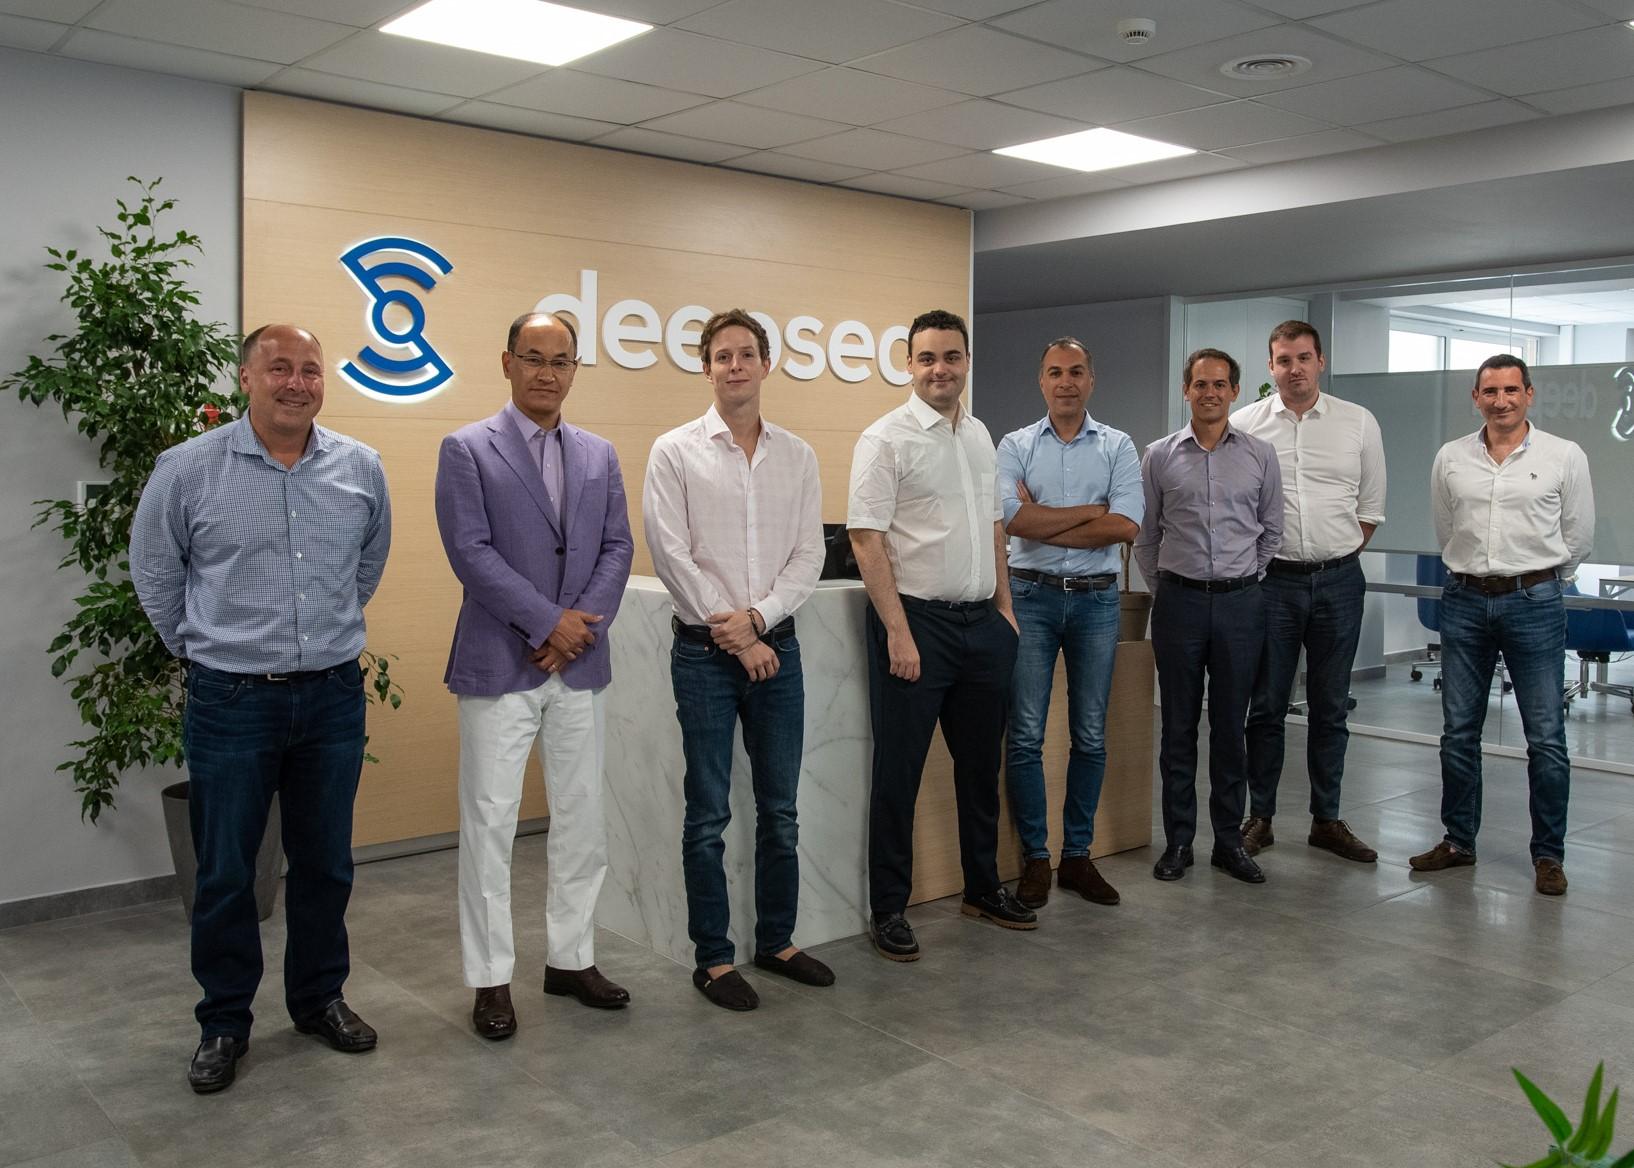 DeepSea Technologies_Νέος επενδυτικός γύρος 5 εκατ. ευρώ